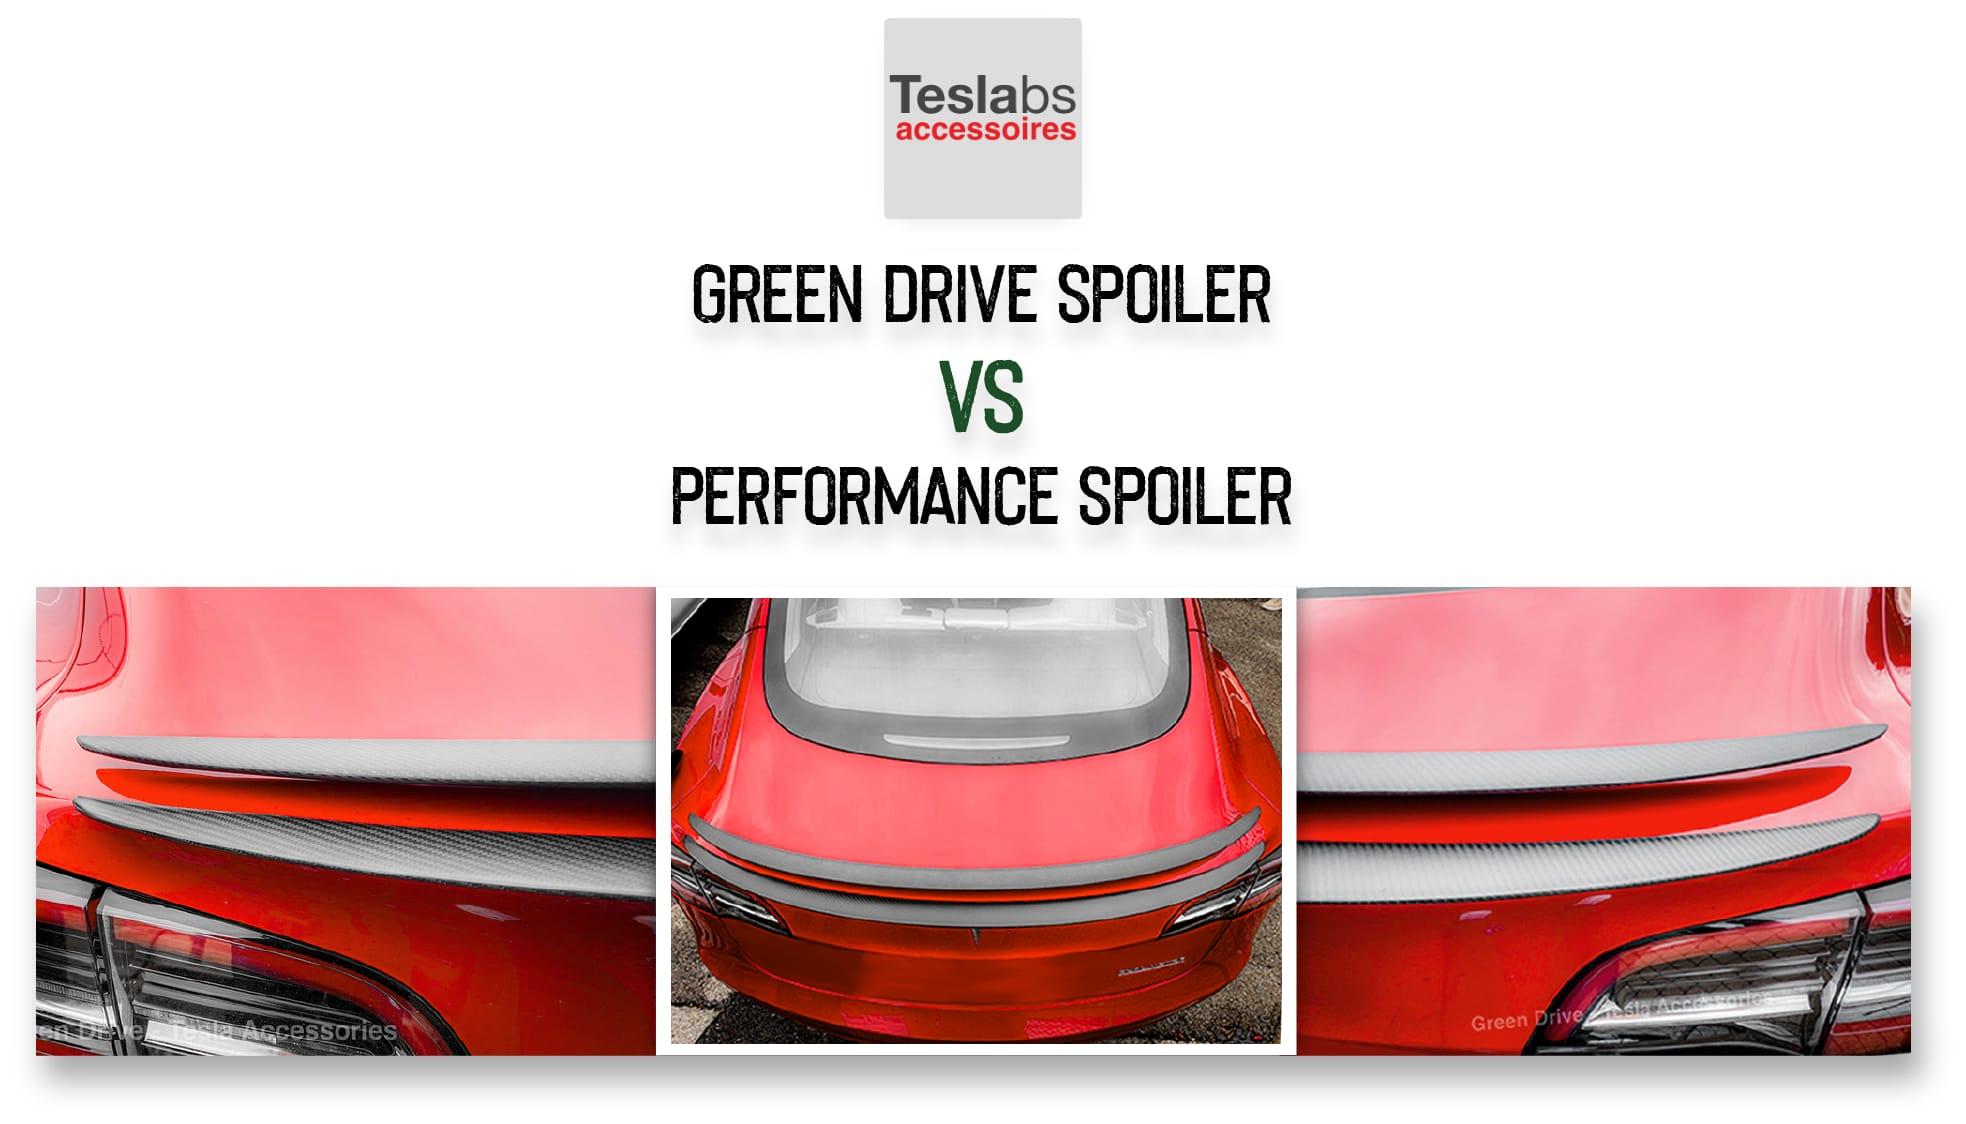 Model 3 Performance Spoiler comparison